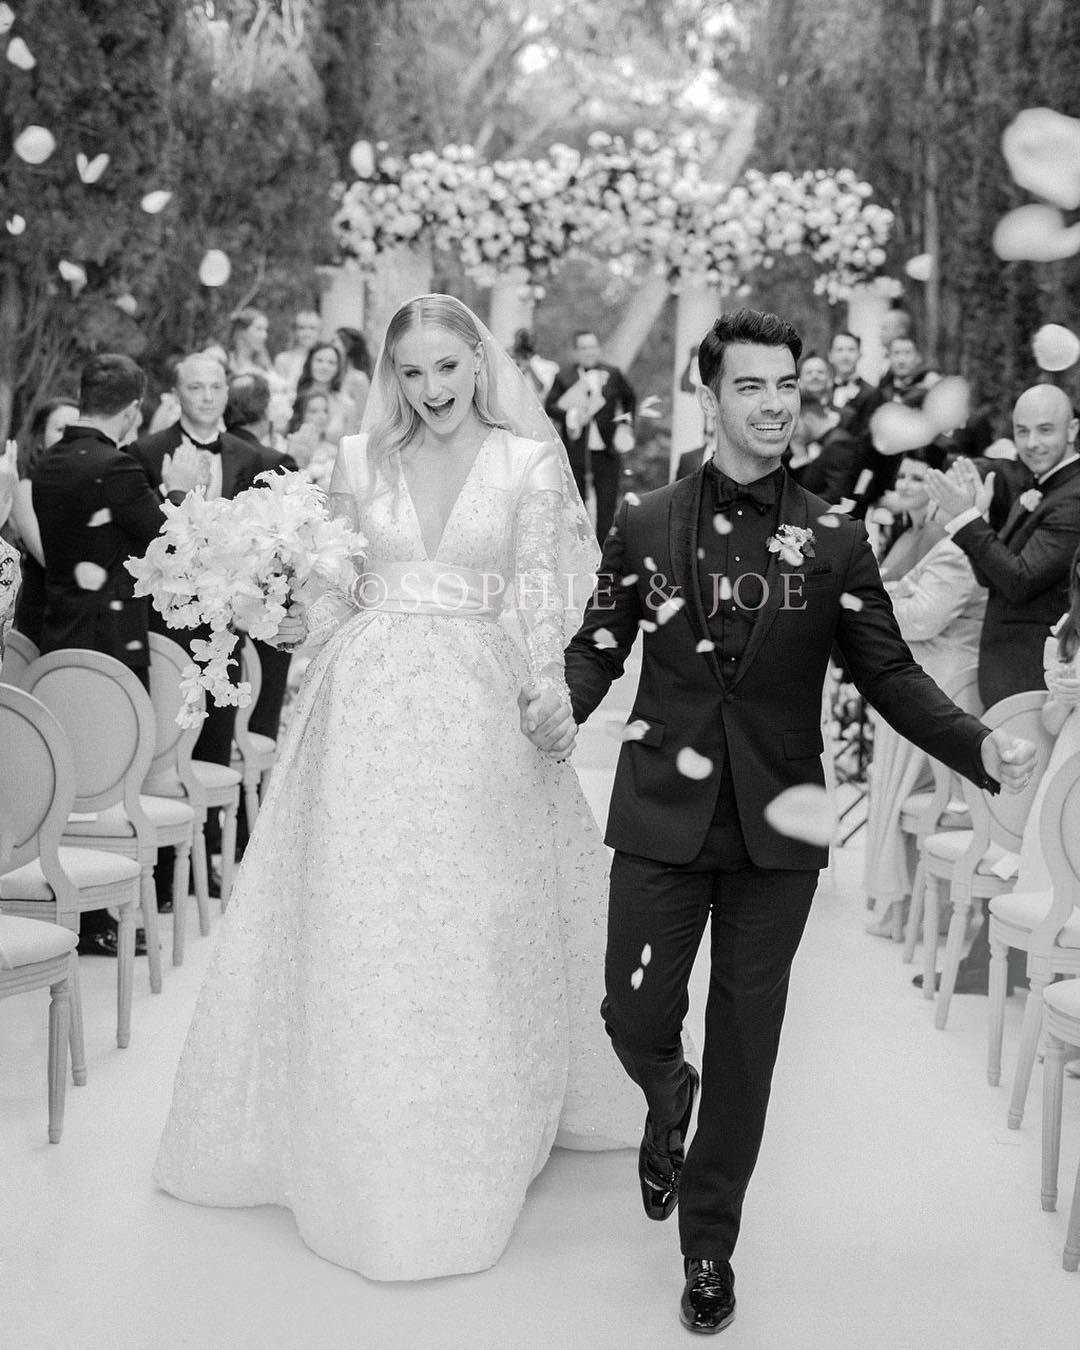 Svadba slávnych II - Spevák Joe Jonas a Sophie Turner